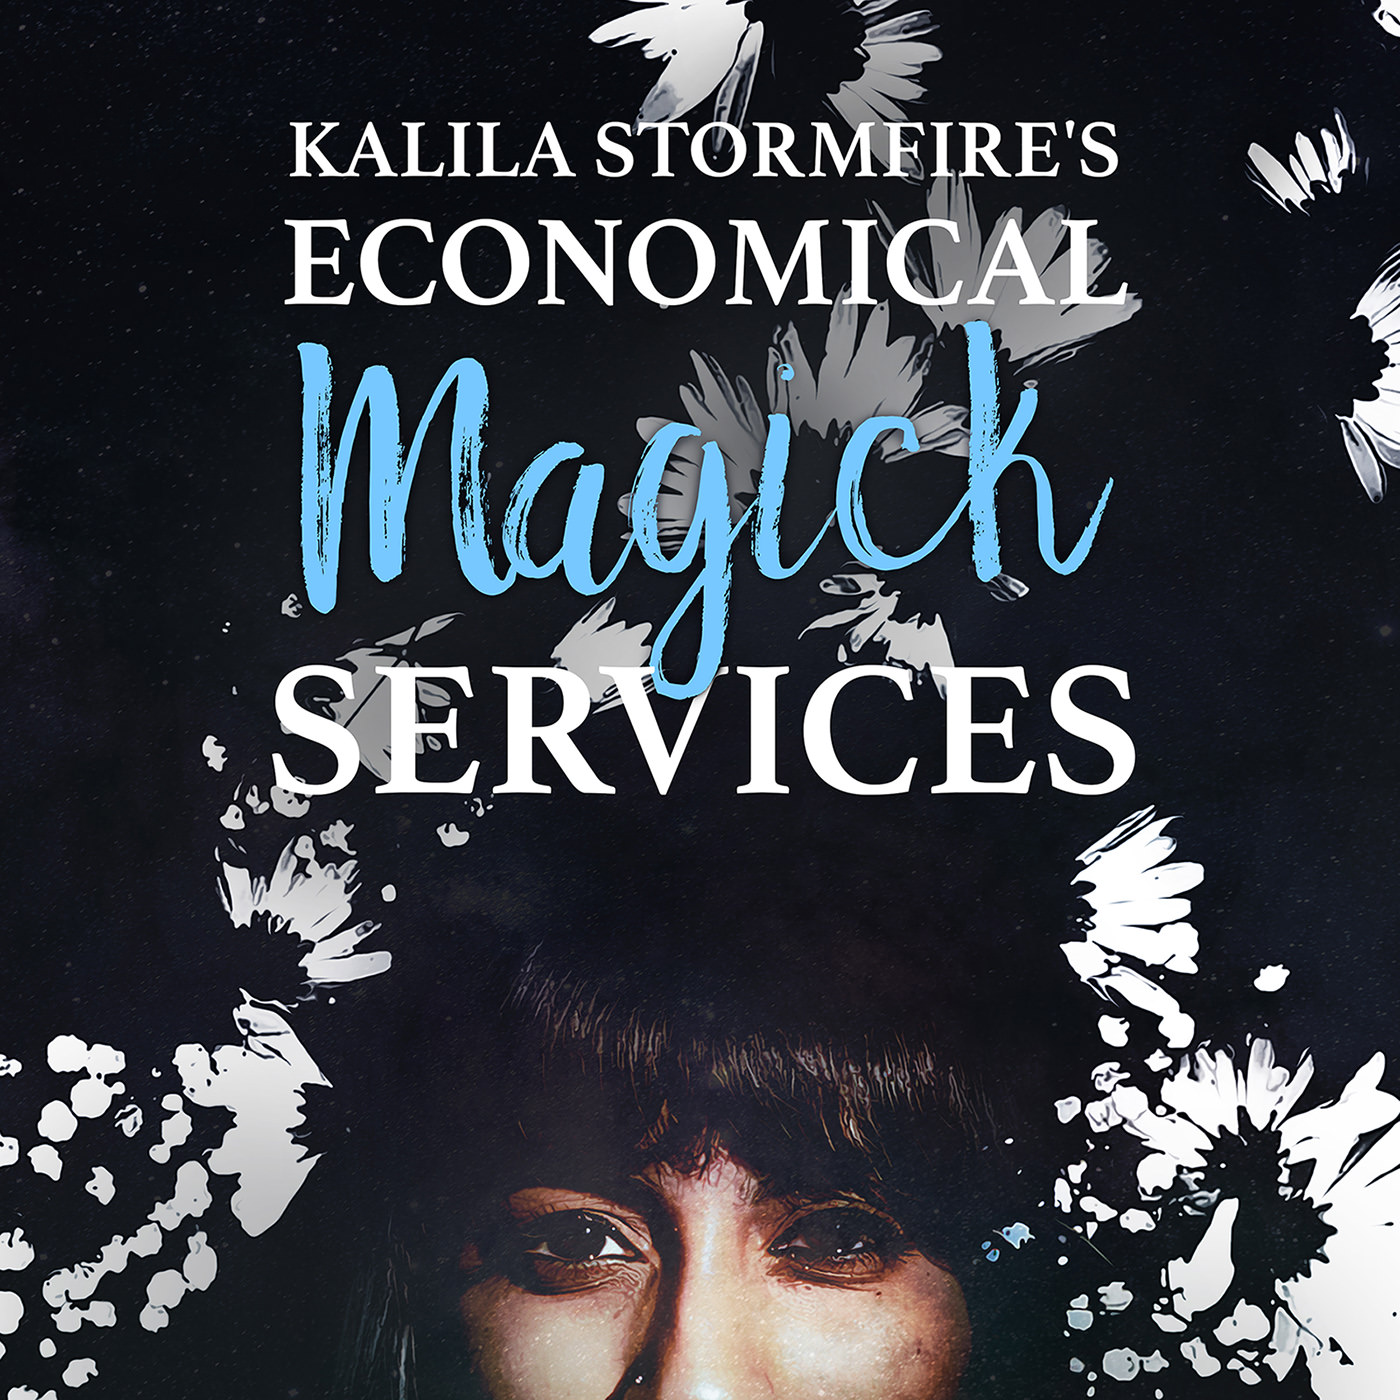 Kalila Stormfire's Economical Magick Services show art